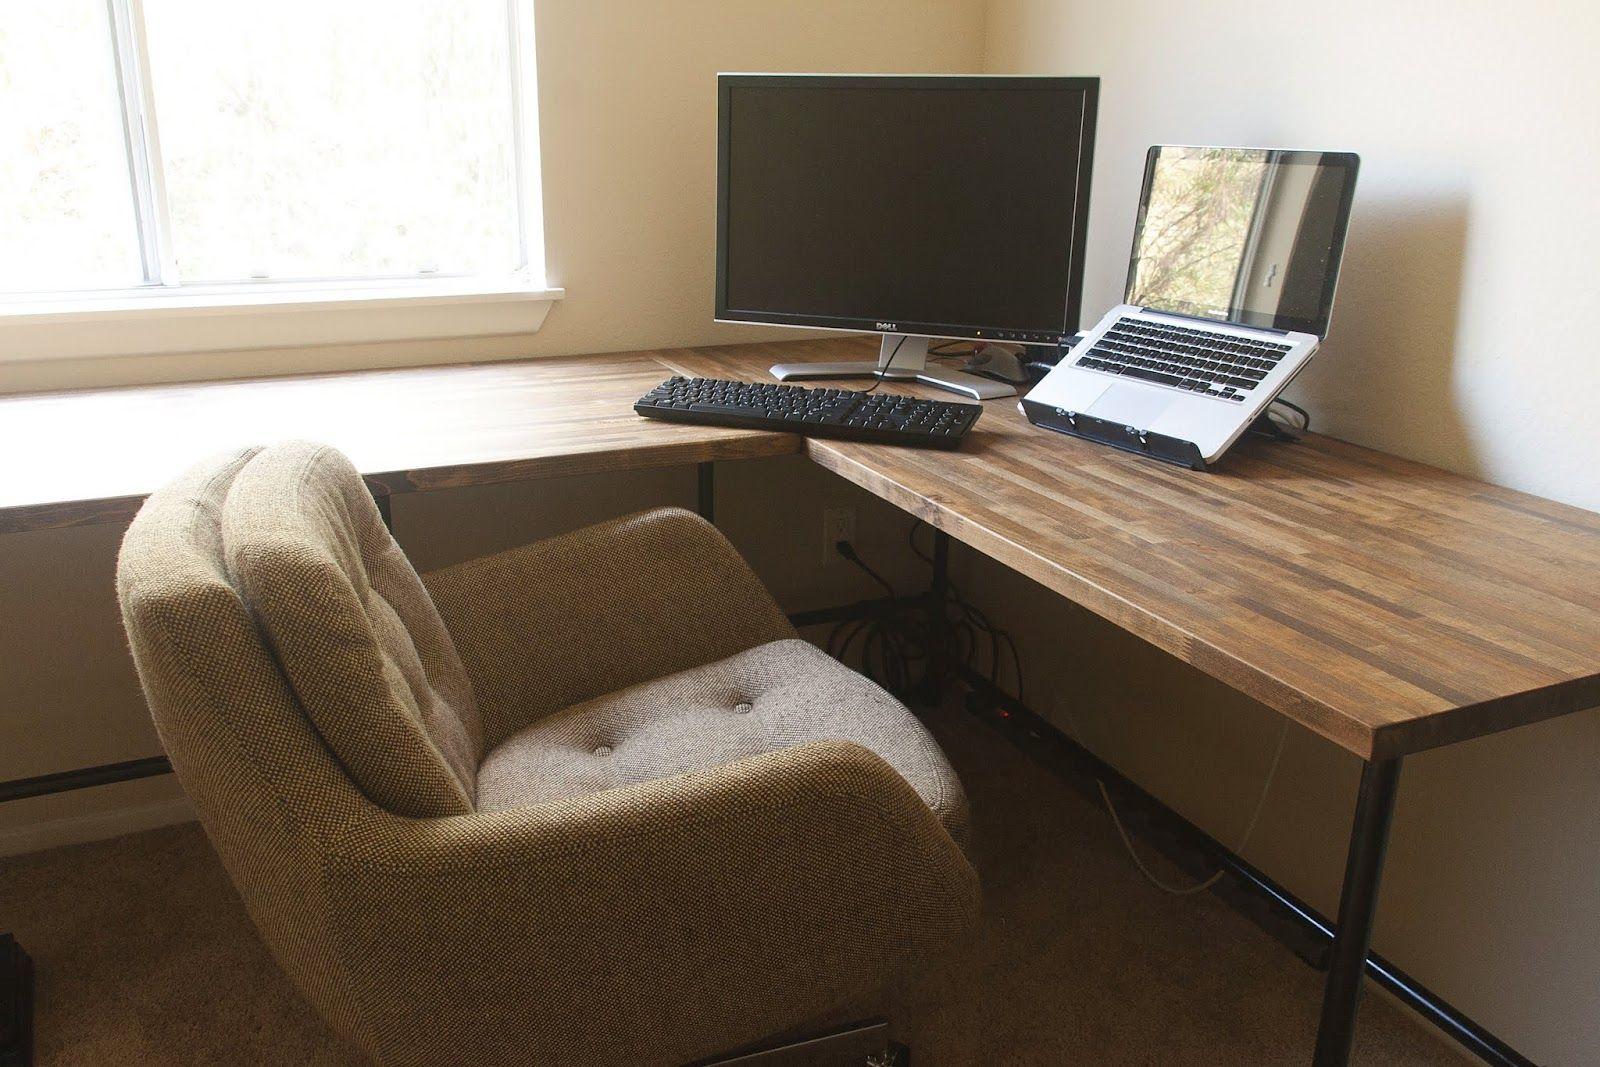 10 innovative diy office desk design ideas awesome lshaped corner nature wood home plans i